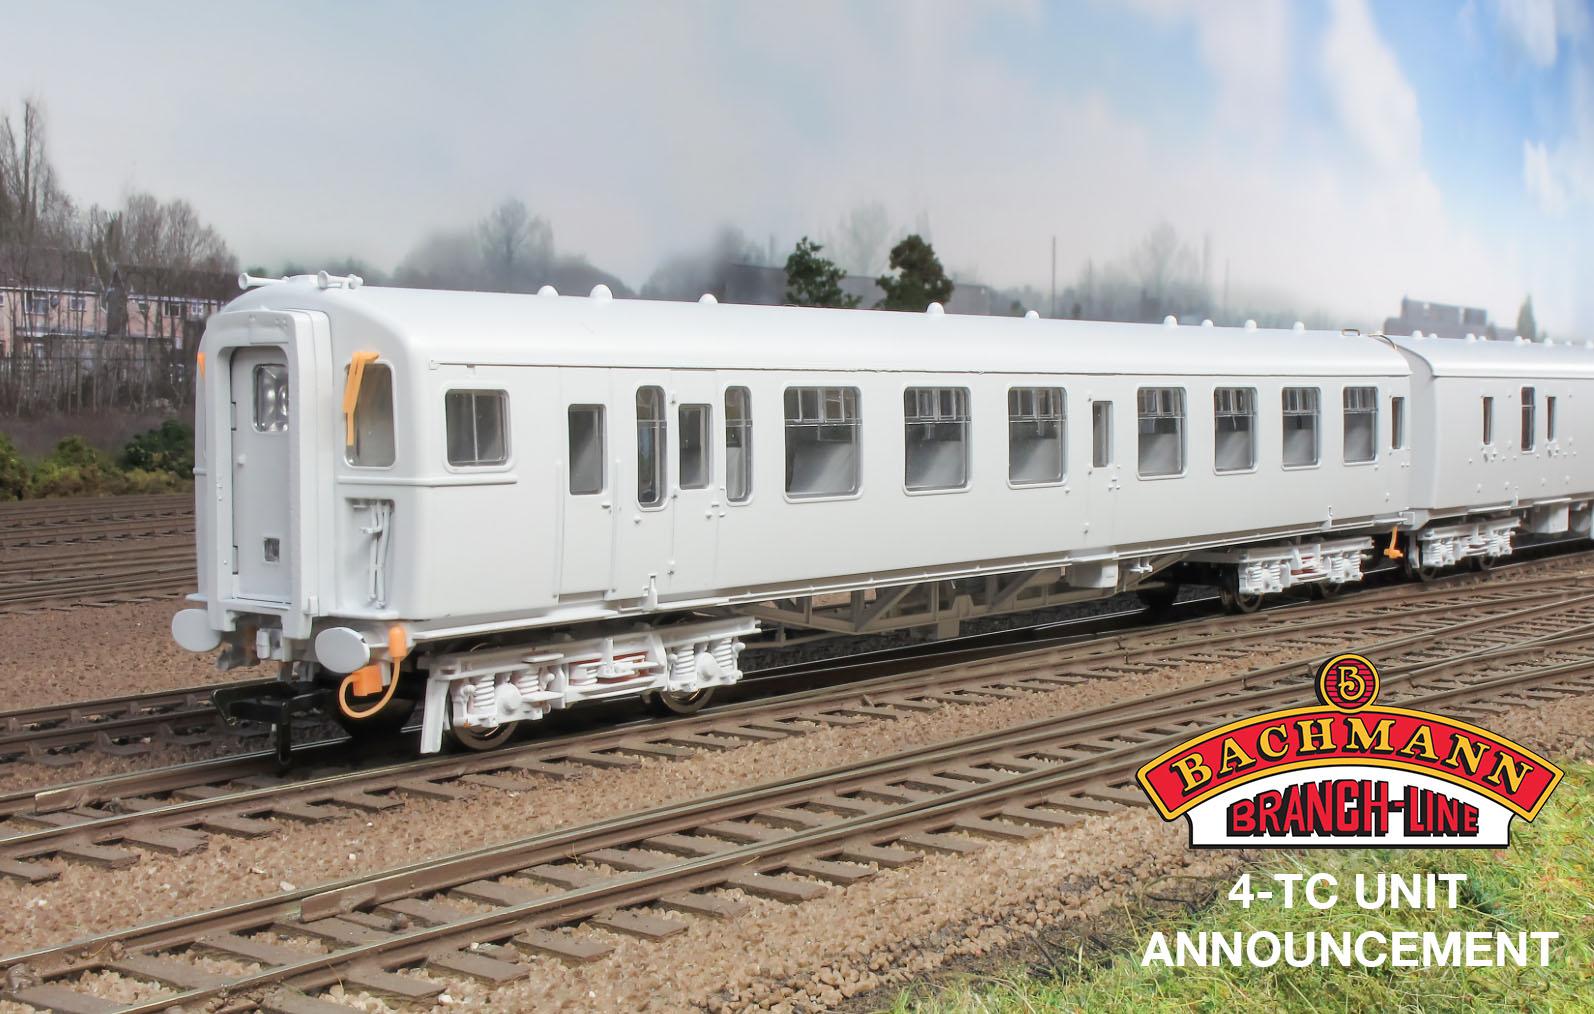 Bachmann Class 4-TC Page Image